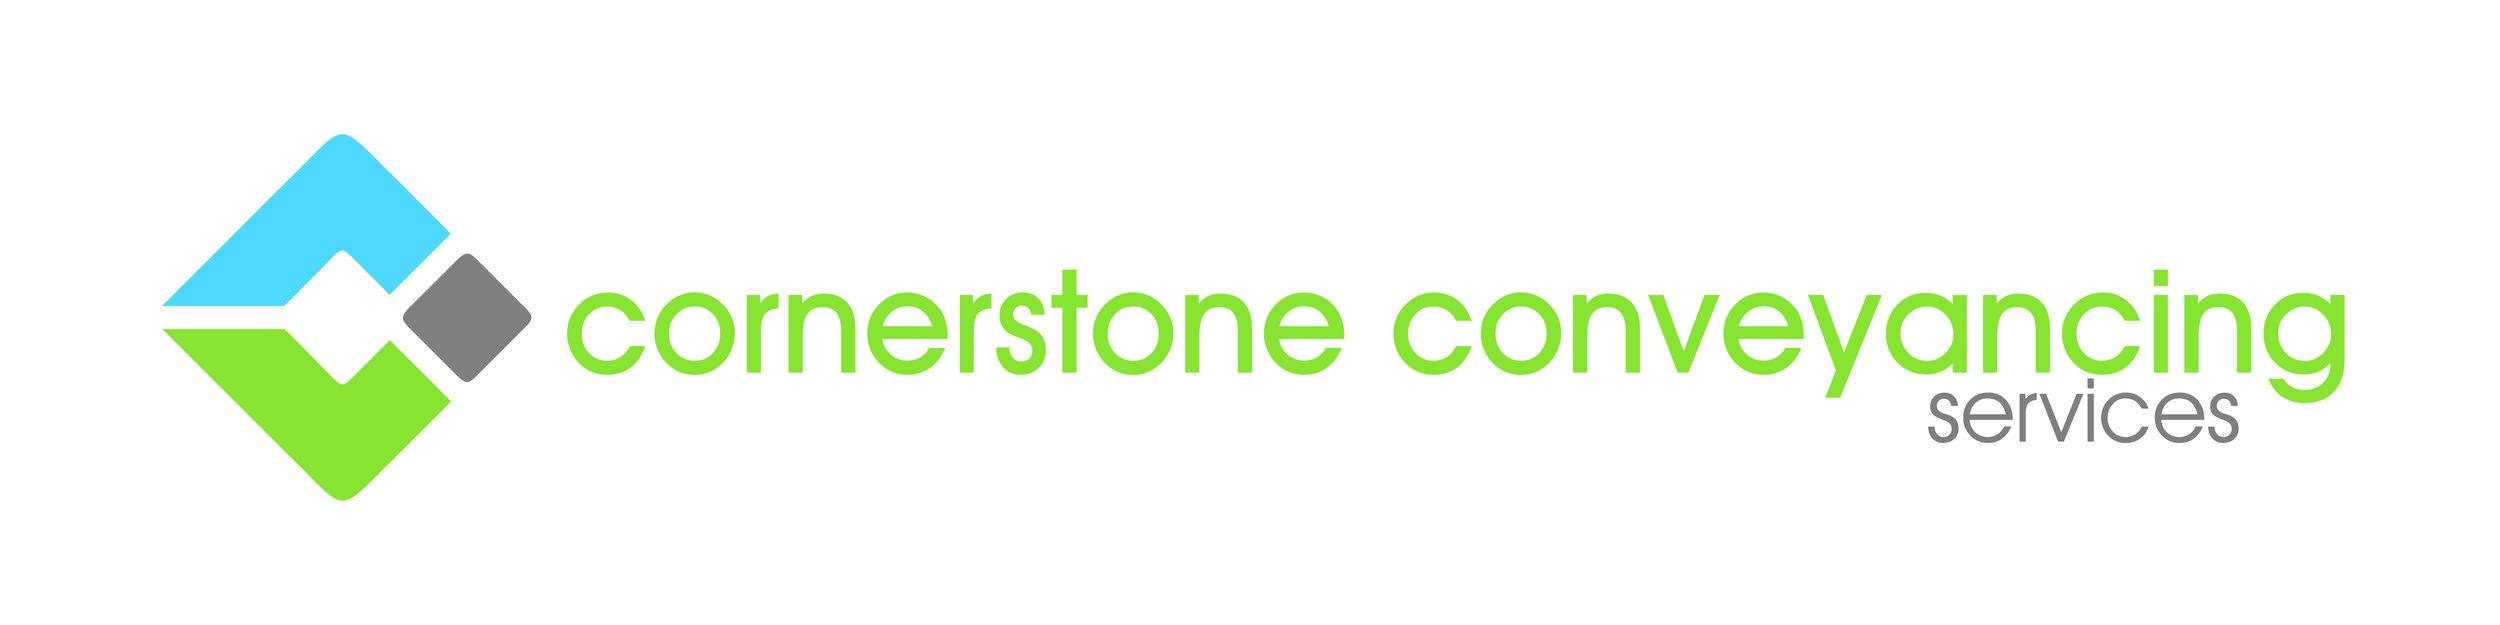 cornerstone logo white-02.jpg